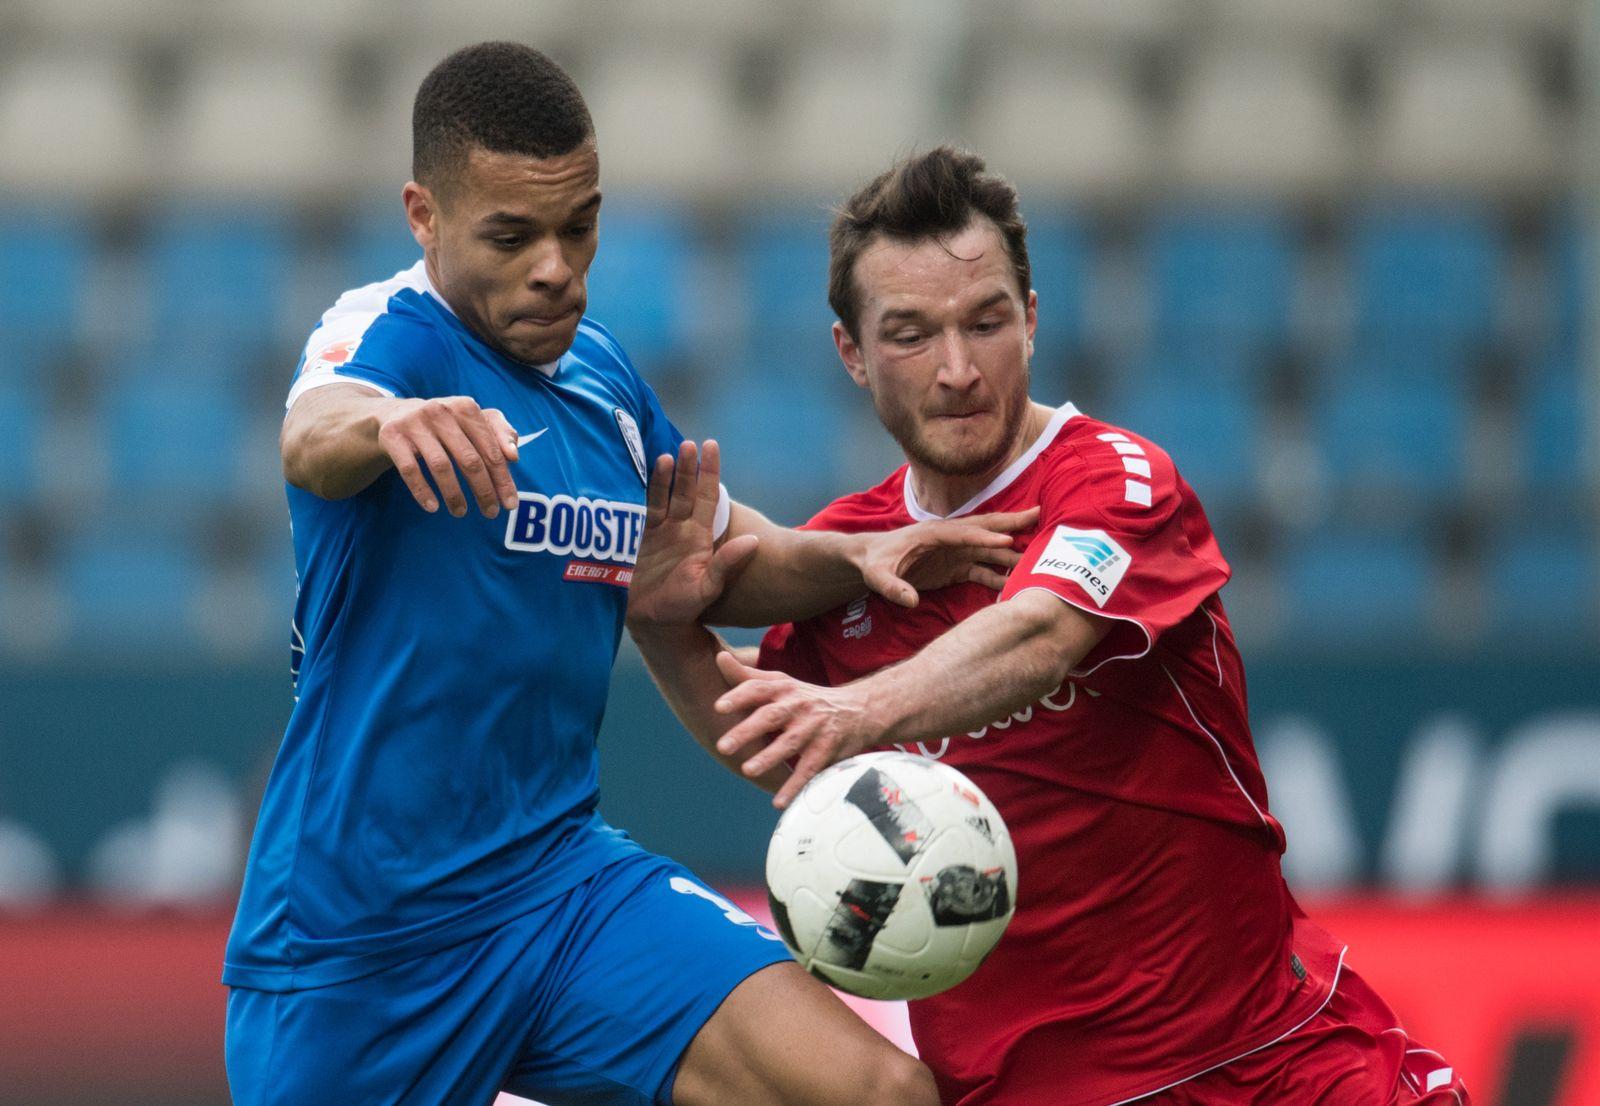 VfL Bochum - Würzburger Kickers